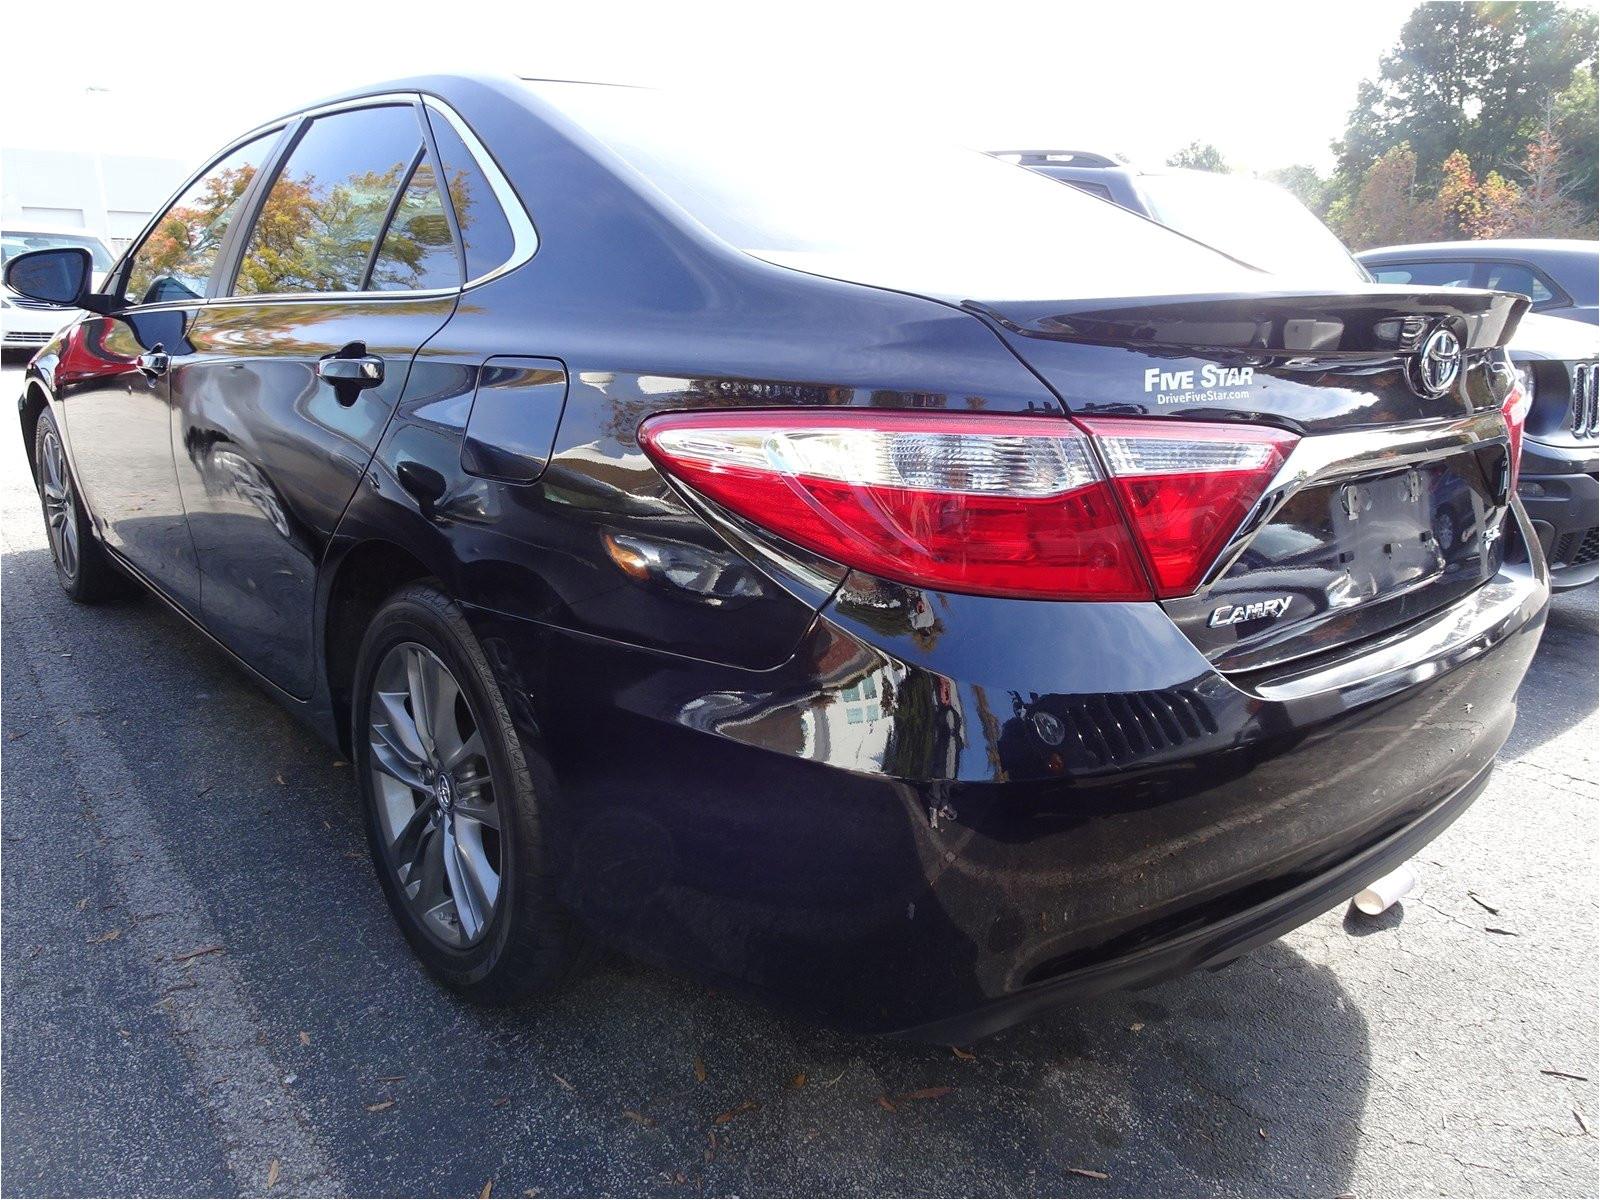 Five Star Macon Ga Mazda Used Vehicles for Sale Near Macon Ga Landmark Dodge